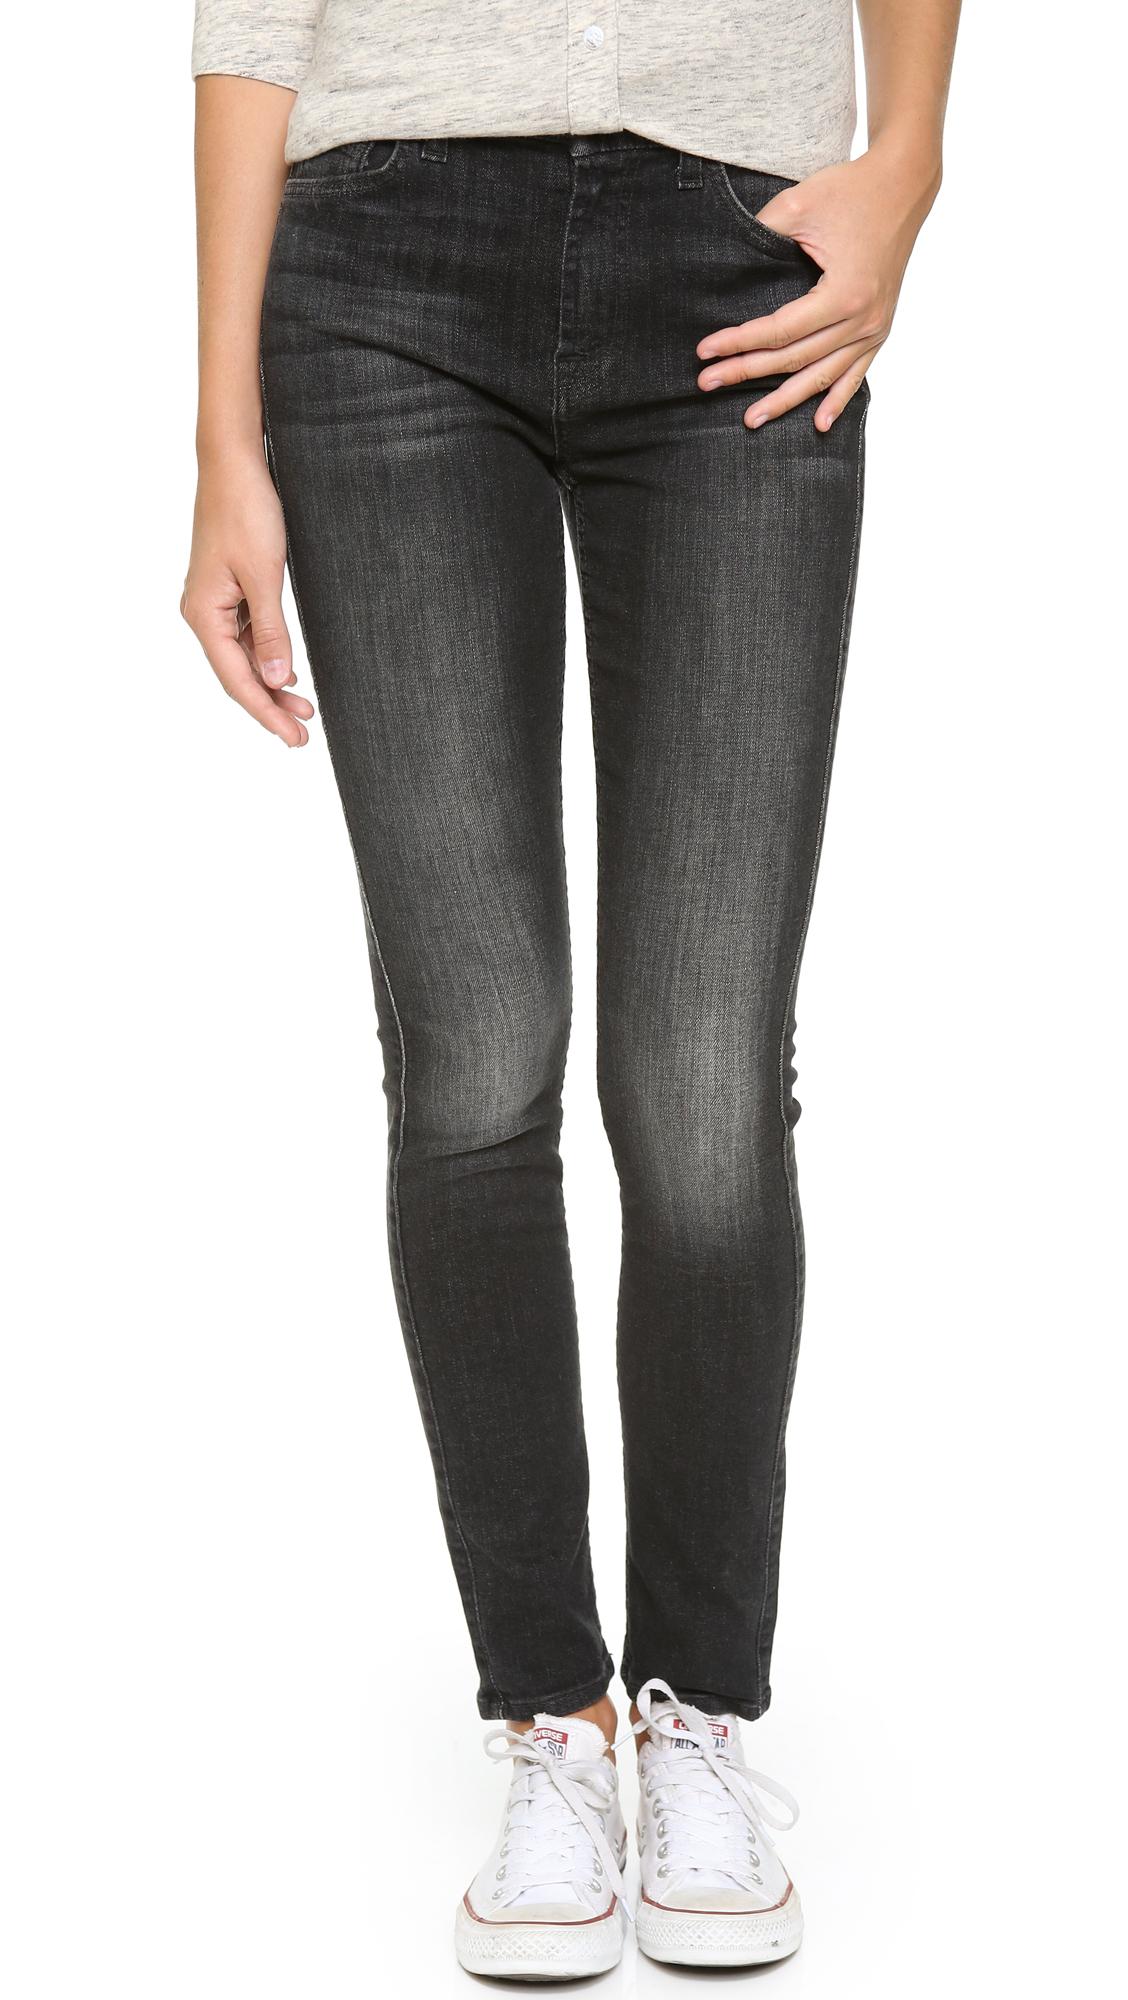 Black 7 Jeans